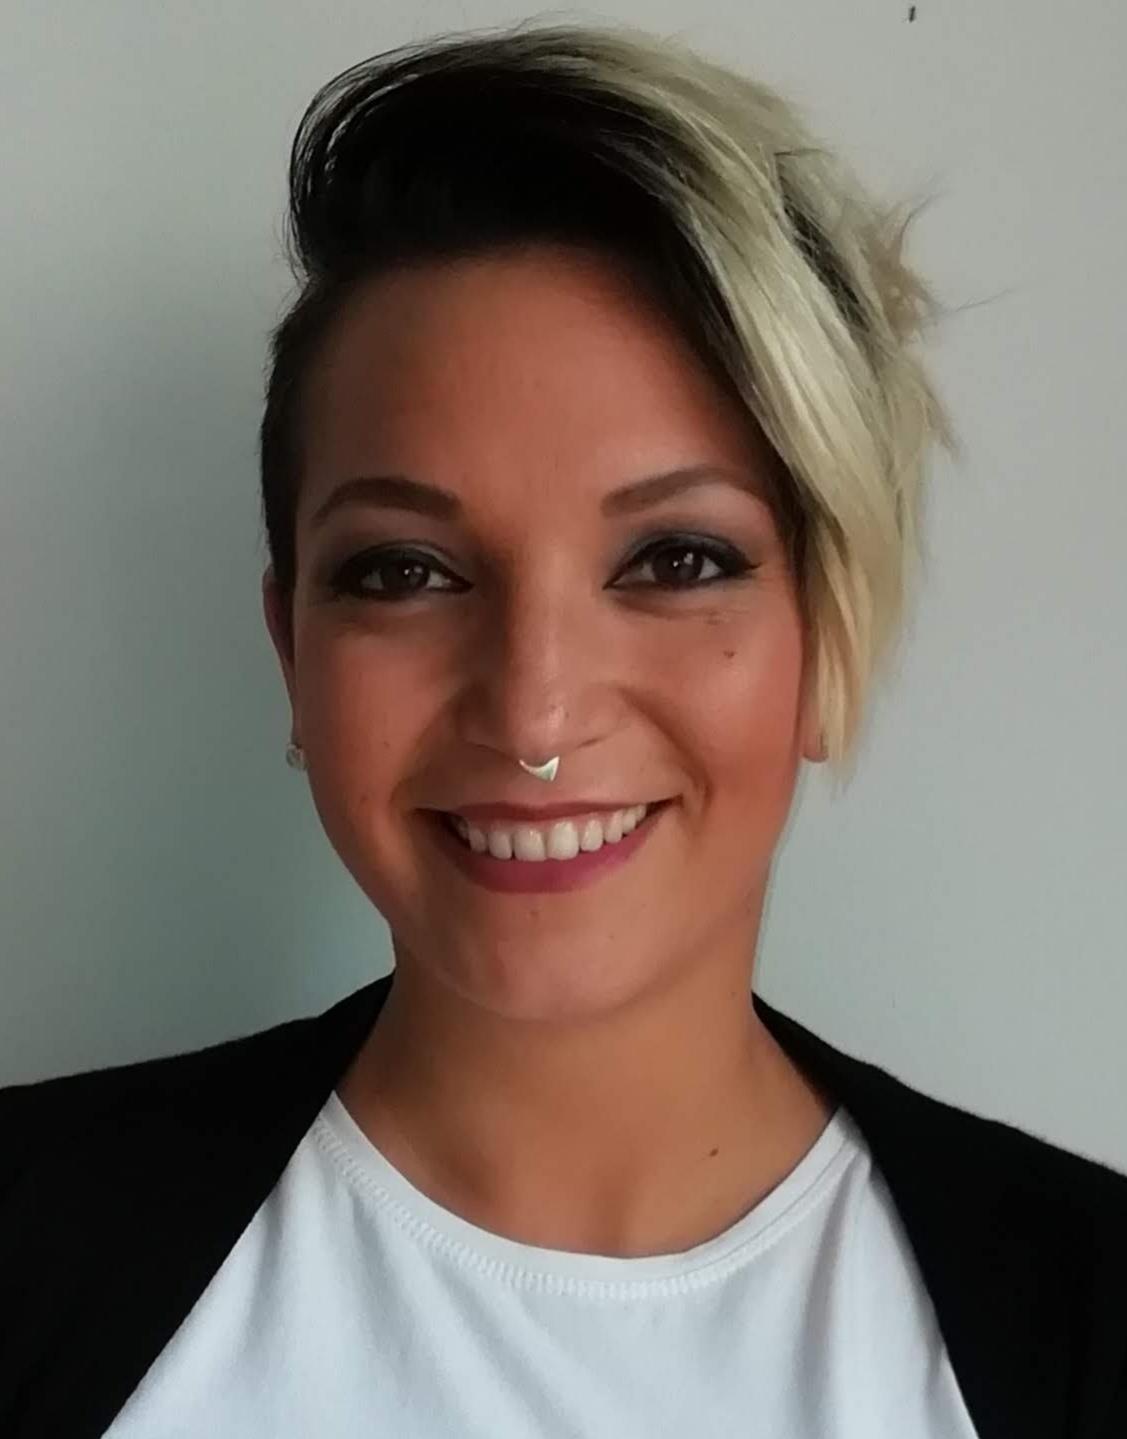 Almudena, 42 years old, Spanish